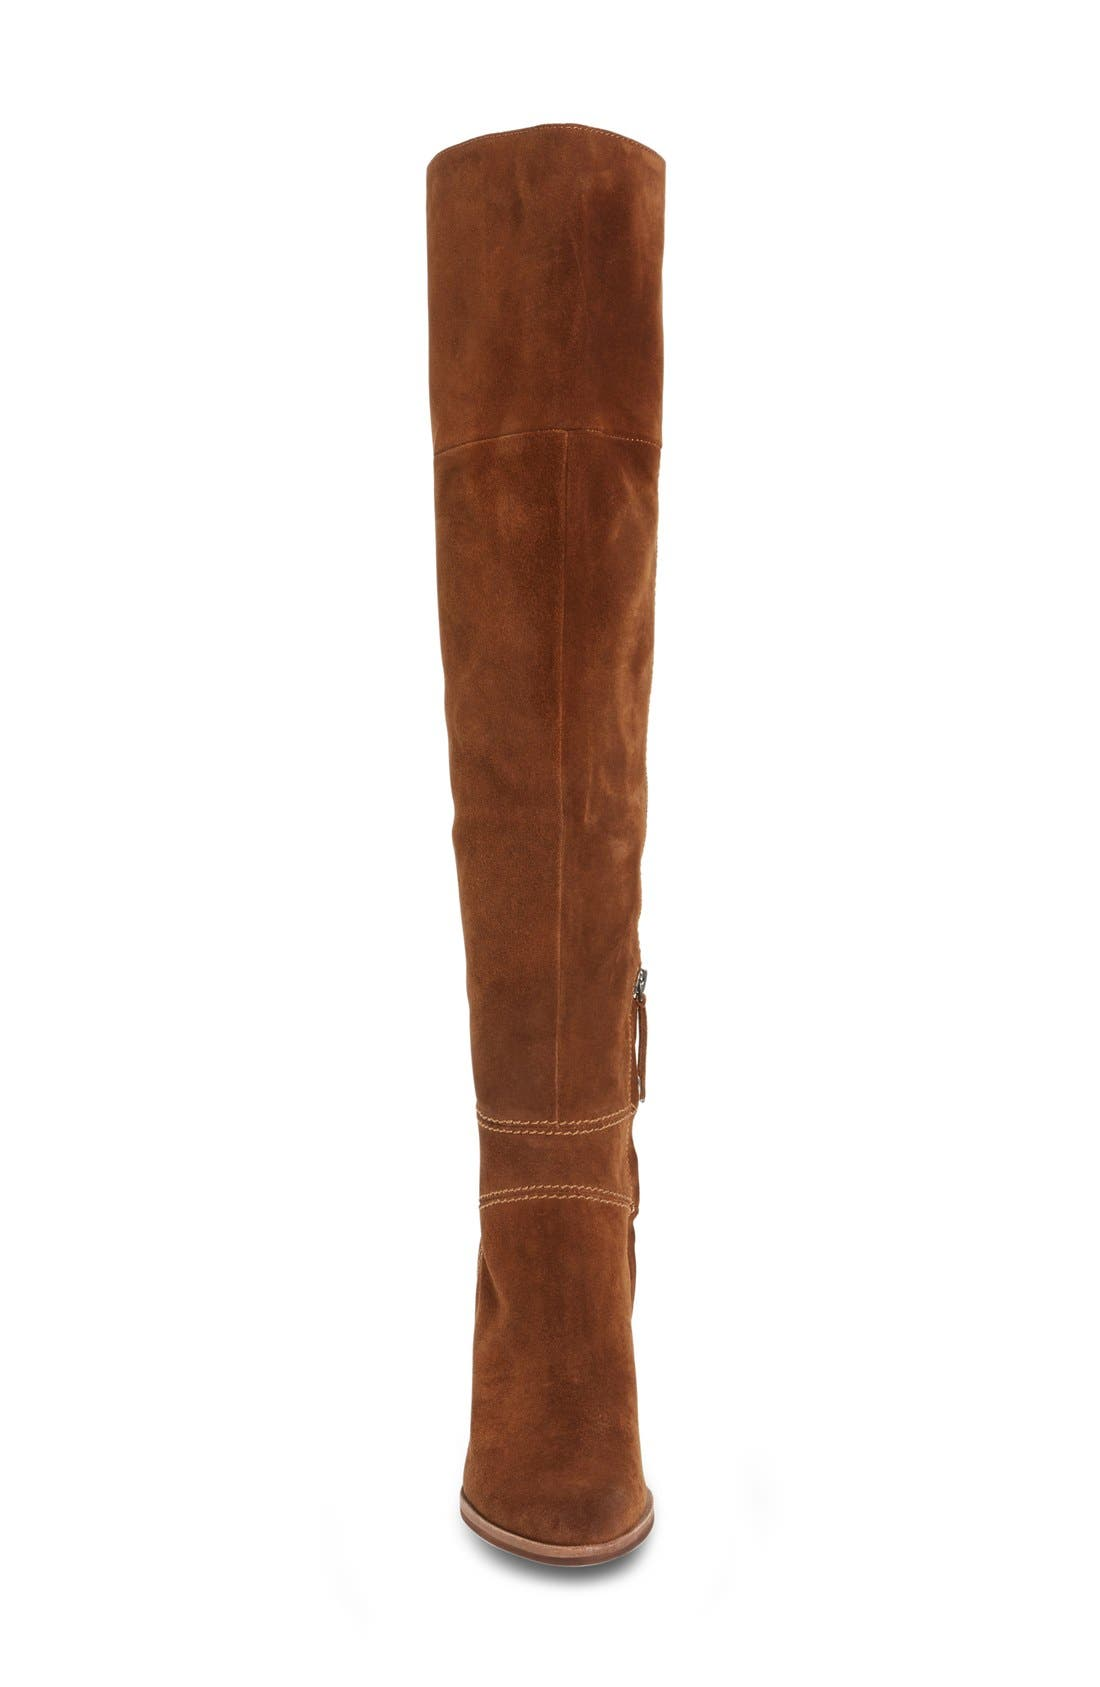 Alternate Image 3  - Dolce Vita 'Cash' Over the Knee Boot (Women)